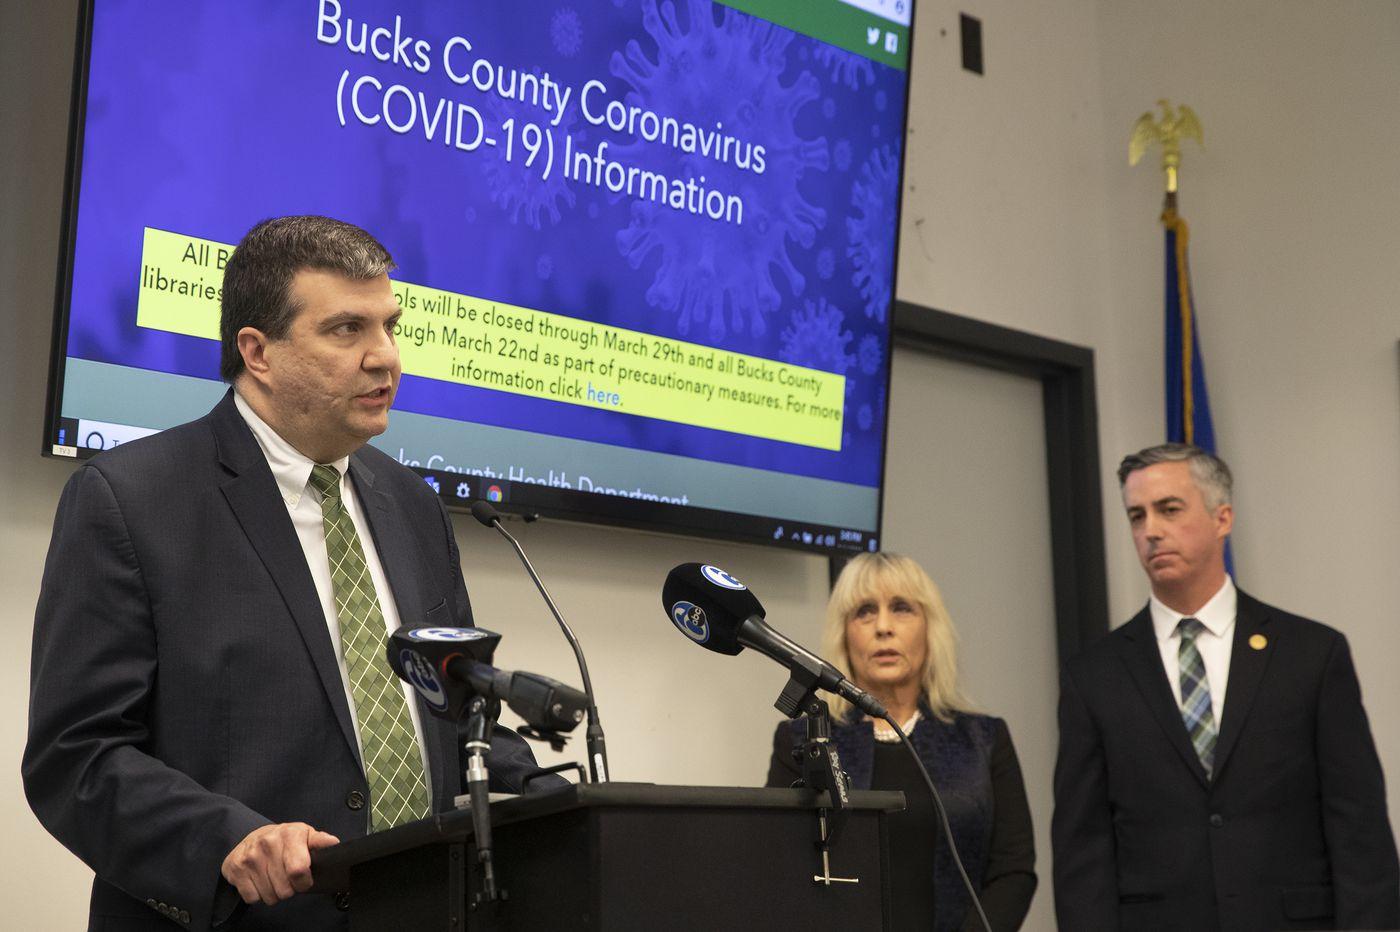 Over 9 days, Bucks County saw 100 coronavirus deaths — most in nursing homes